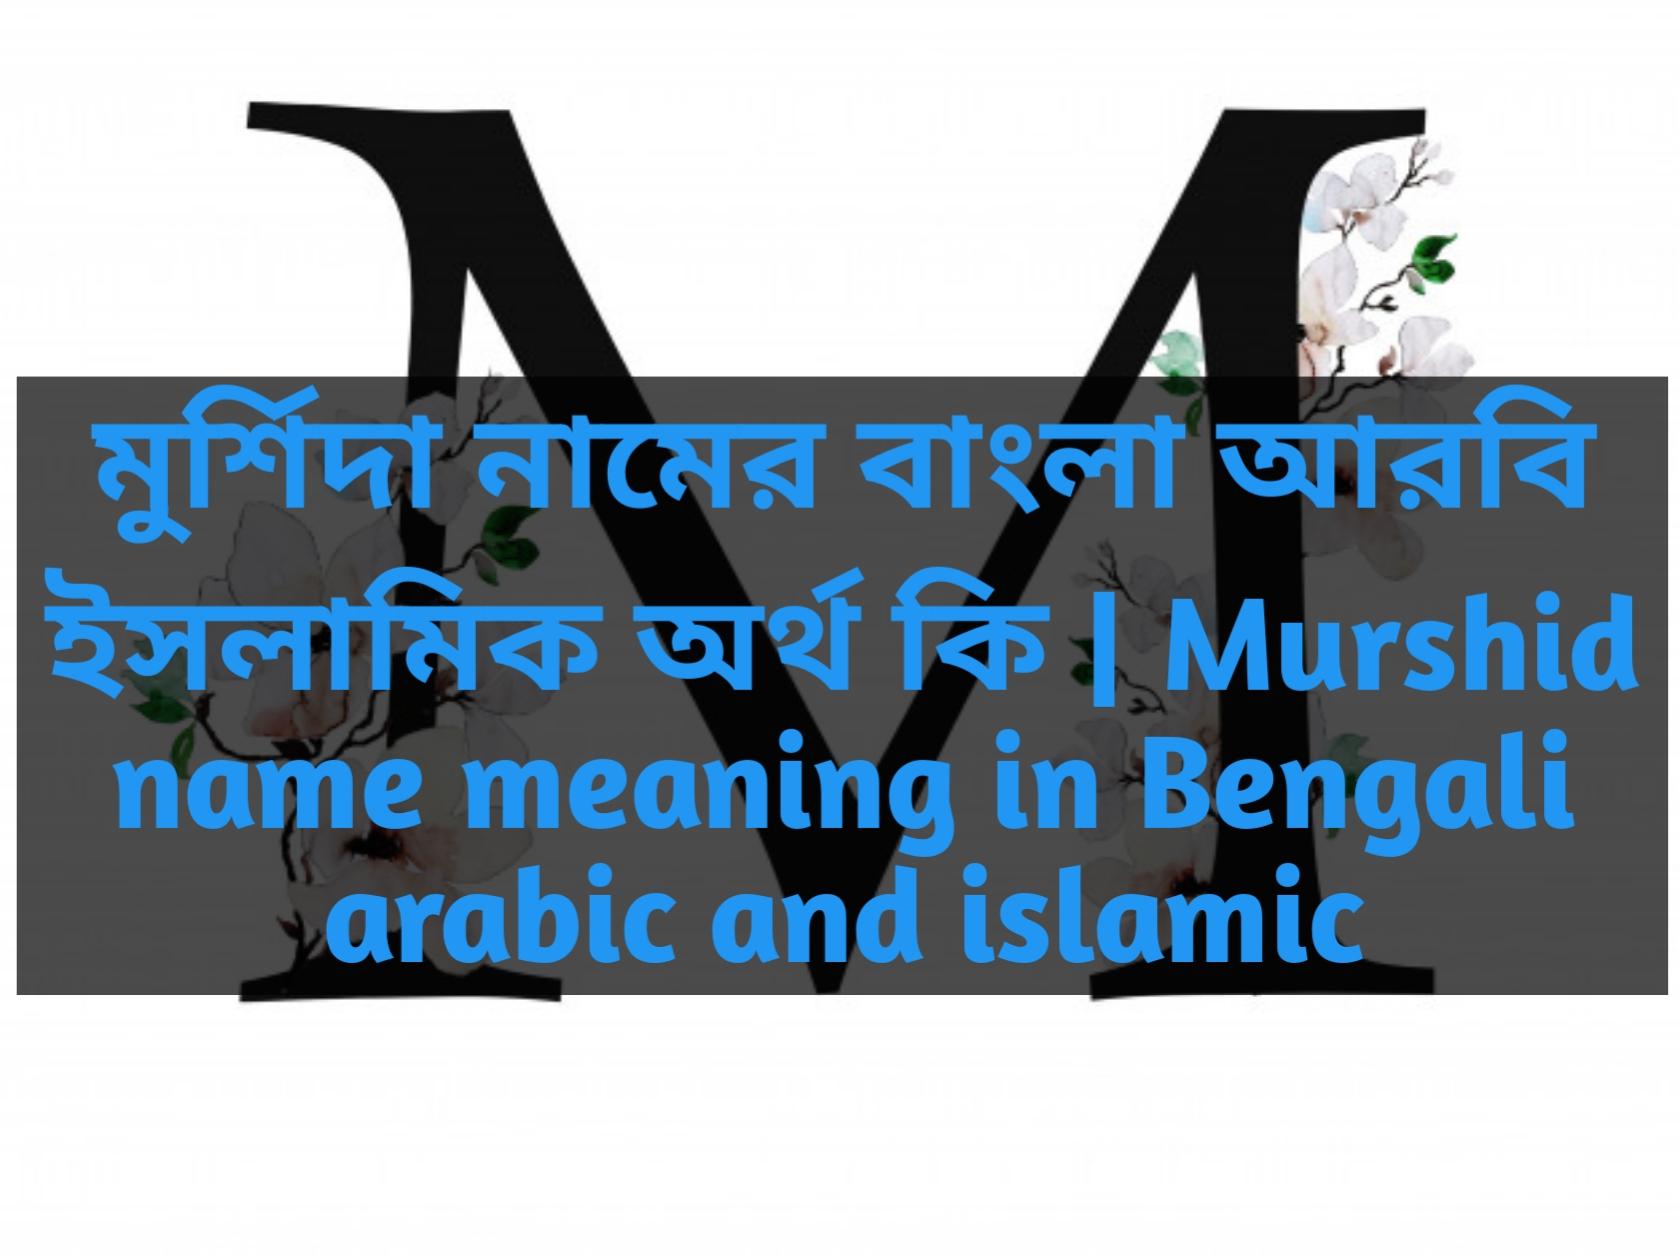 Murshida name meaning in Bengali, মুর্শিদা নামের অর্থ কি, মুর্শিদা নামের বাংলা অর্থ কি, মুর্শিদা নামের ইসলামিক অর্থ কি,